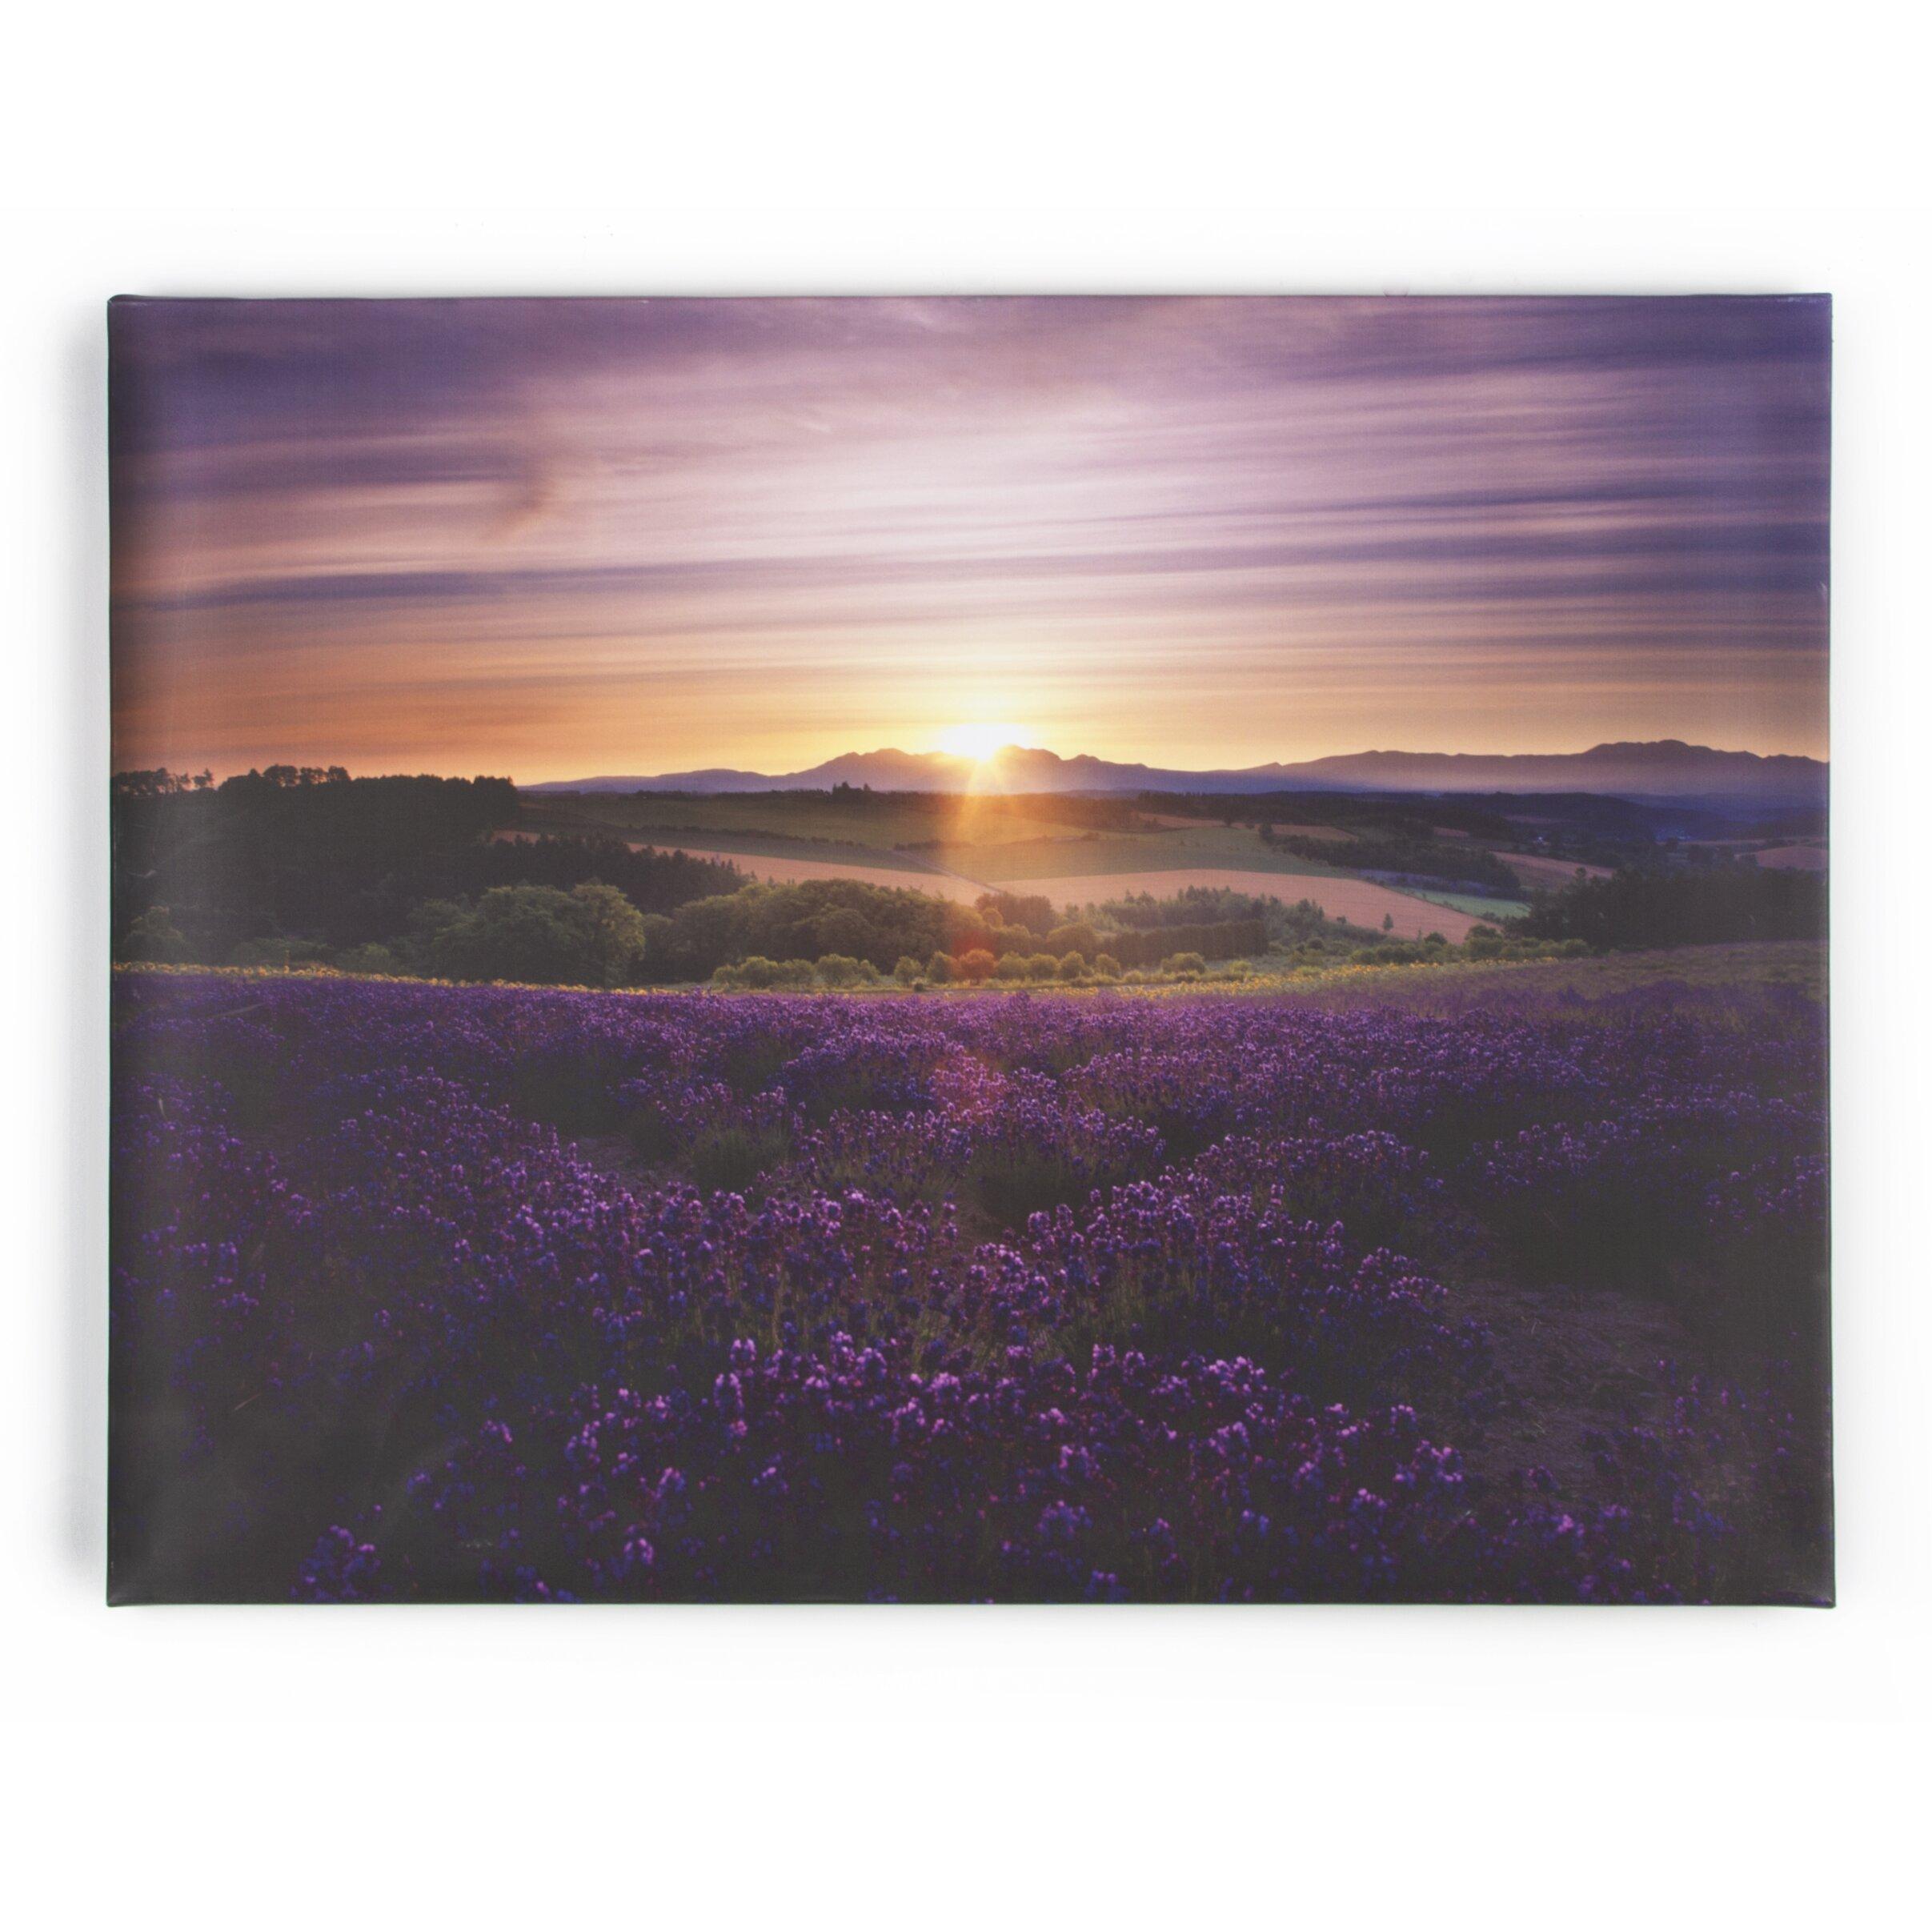 Plum Accessories For Bedroom Purple Wall Art Youll Love Wayfair